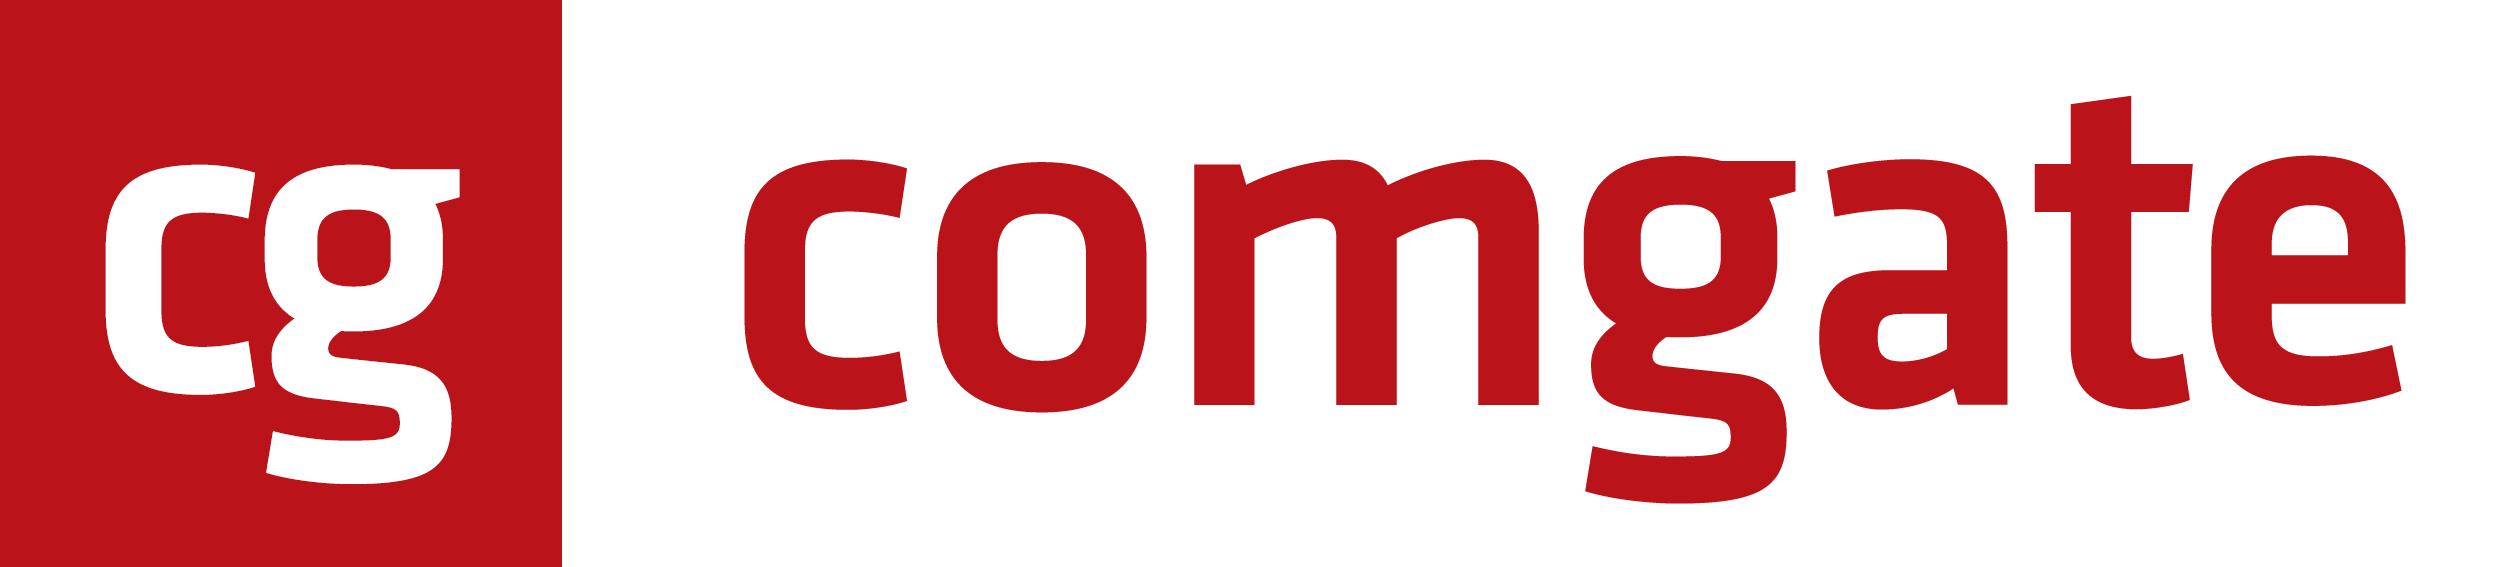 comgate logo.png (38 KB)